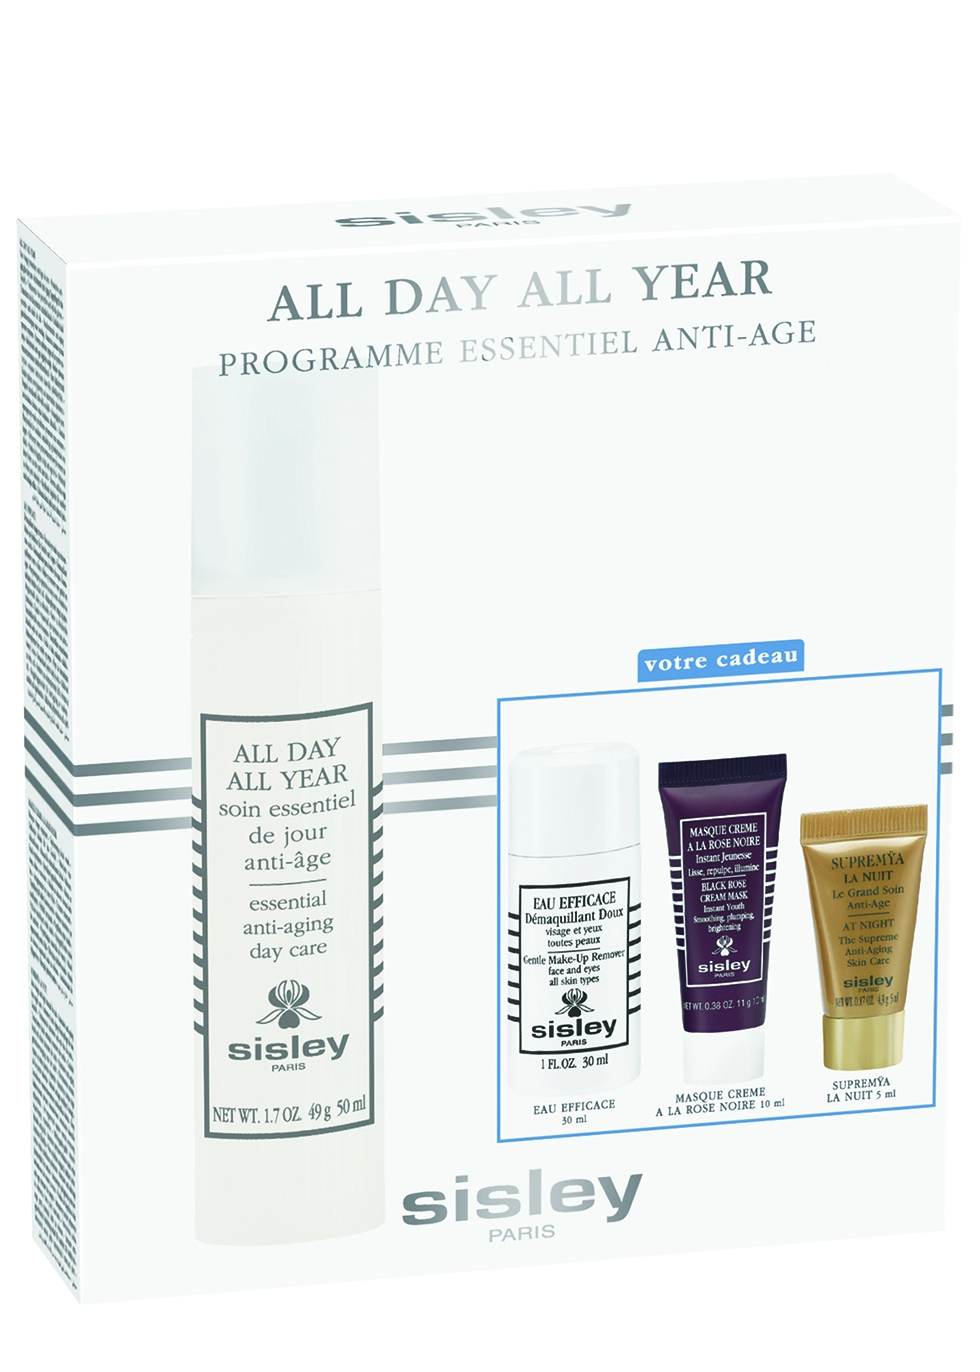 All Day All Year Essential Program